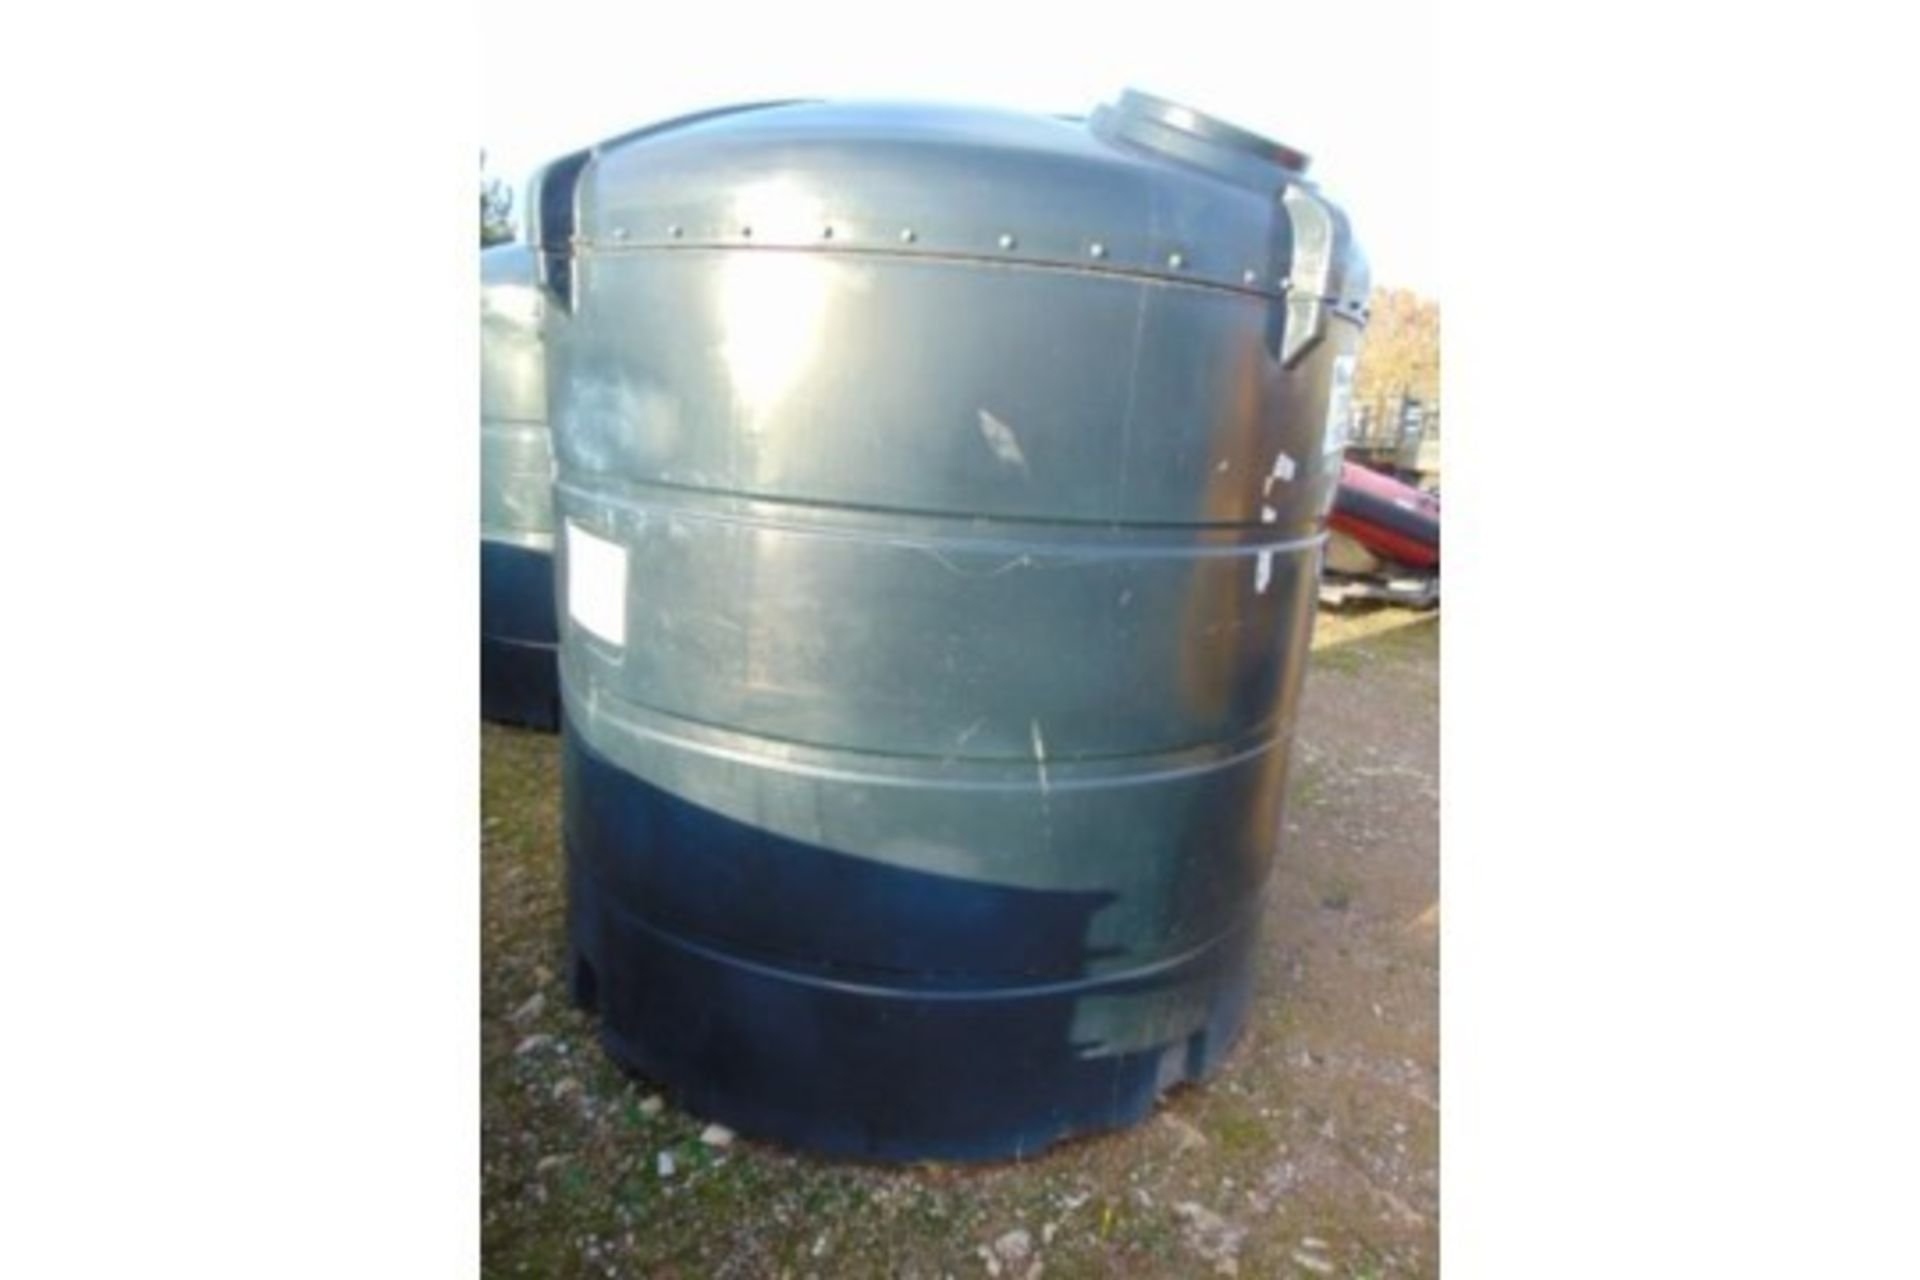 Lot 27211 - 5000 Litre Bunded Oil Tank